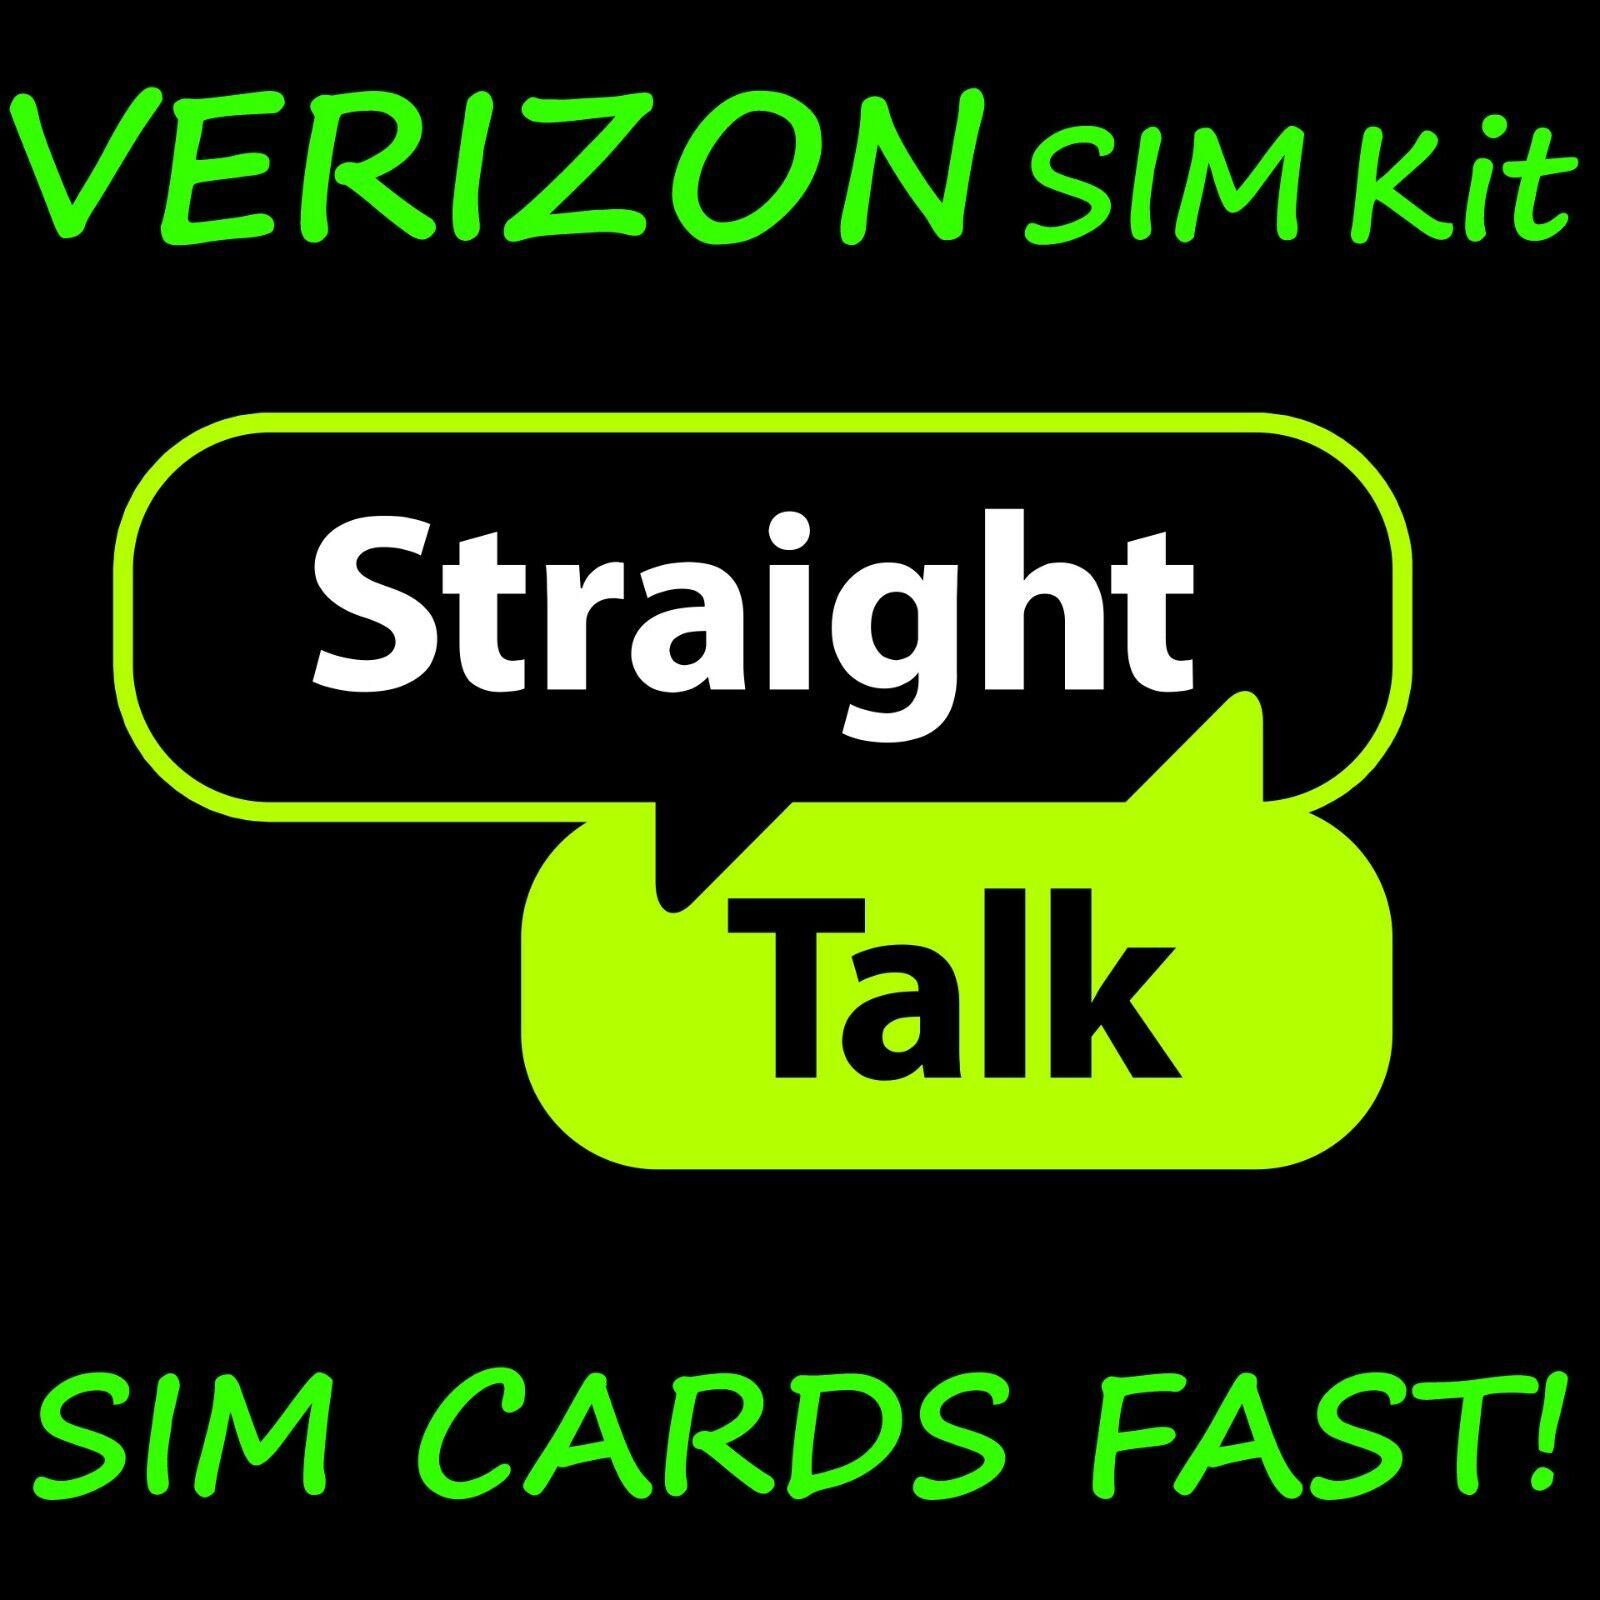 Straight Talk SIM Card For VERIZON CDMA Network Activation K